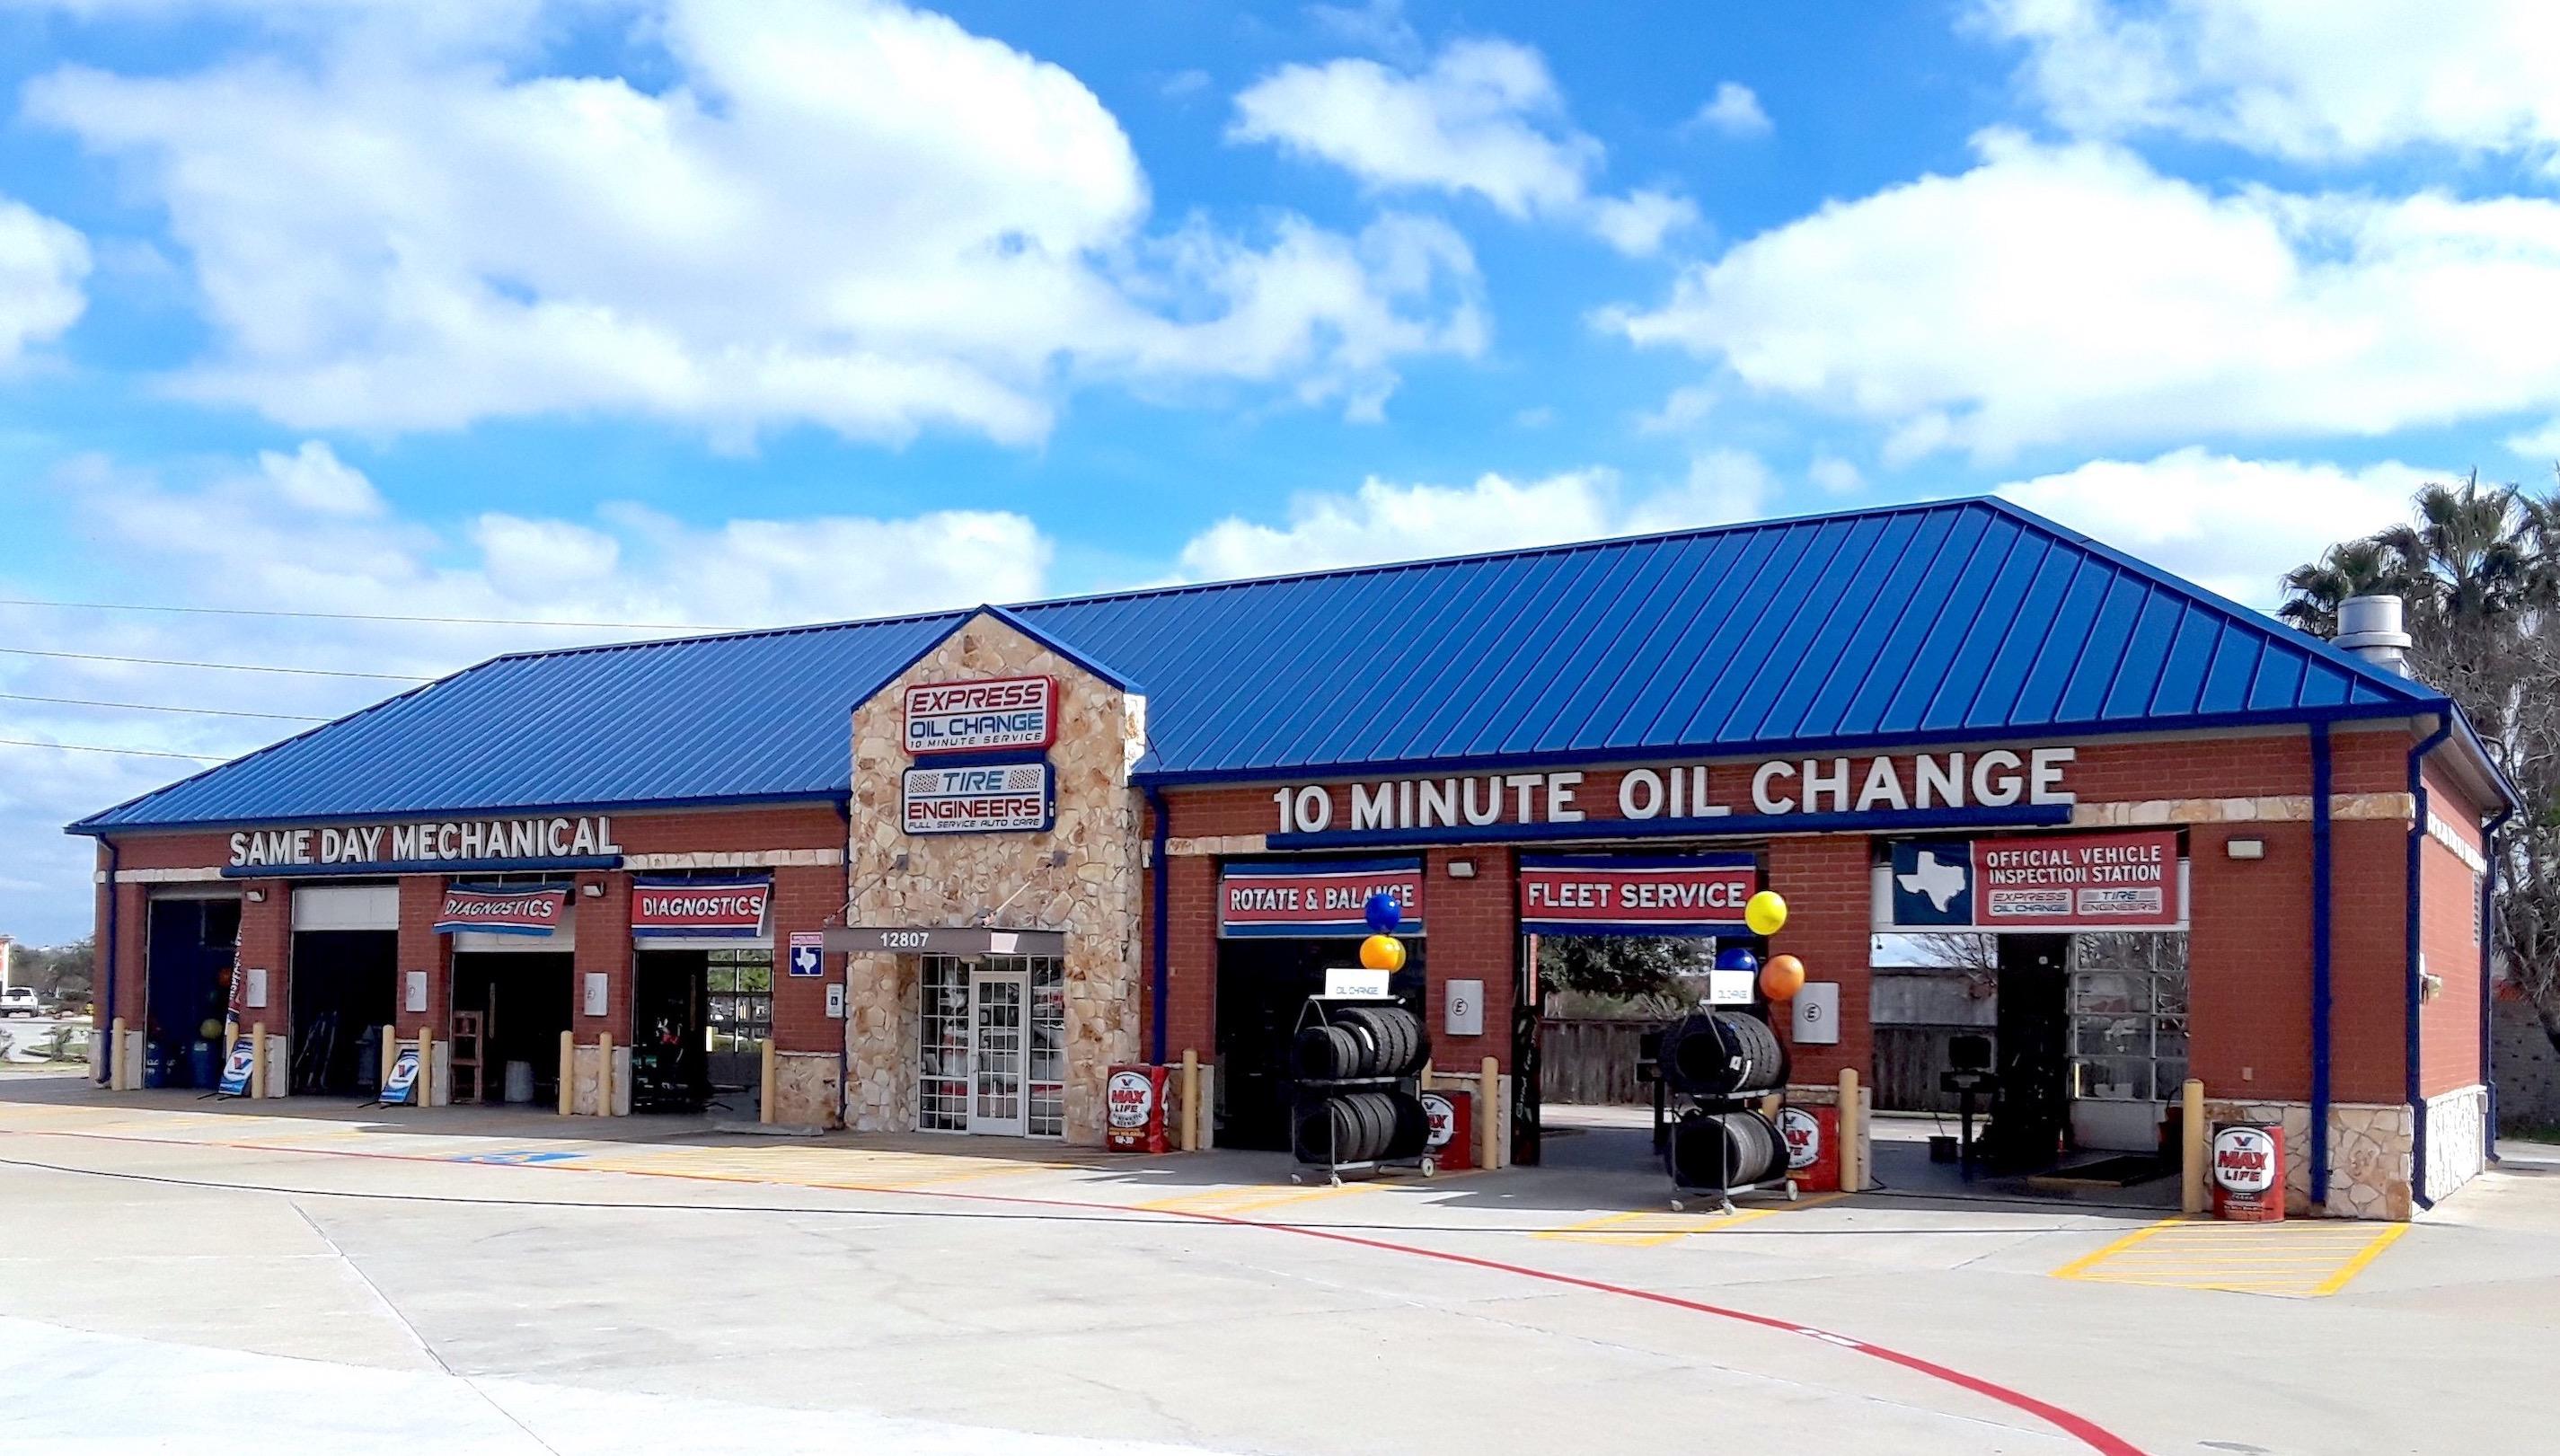 Express Oil Change & Tire Engineers Houston, TX - Eldridge Crossing store